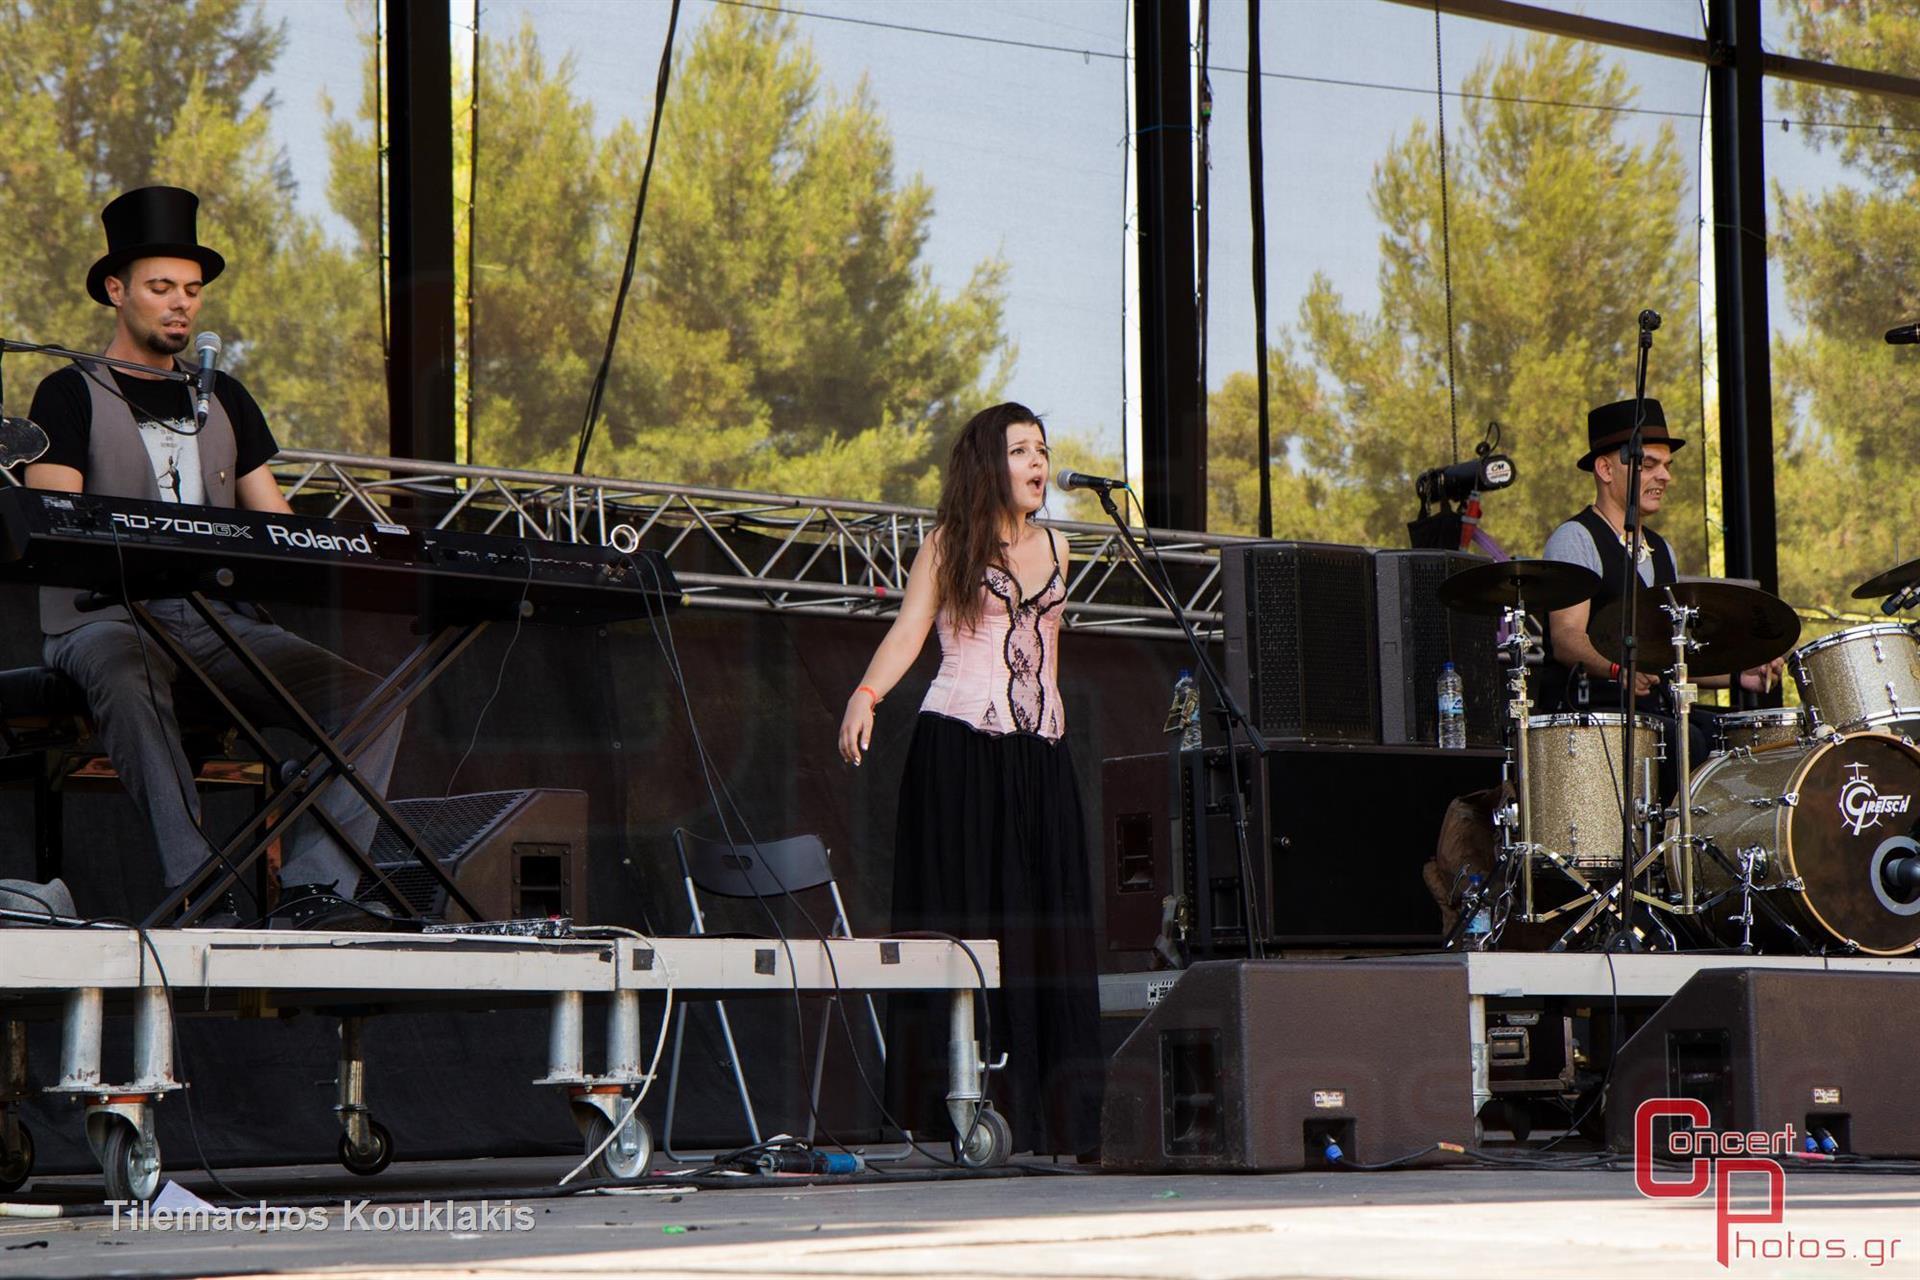 Opera Chaotique-Opera Chaotique photographer: Tilemachos Kouklakis - concertphotos_-0100